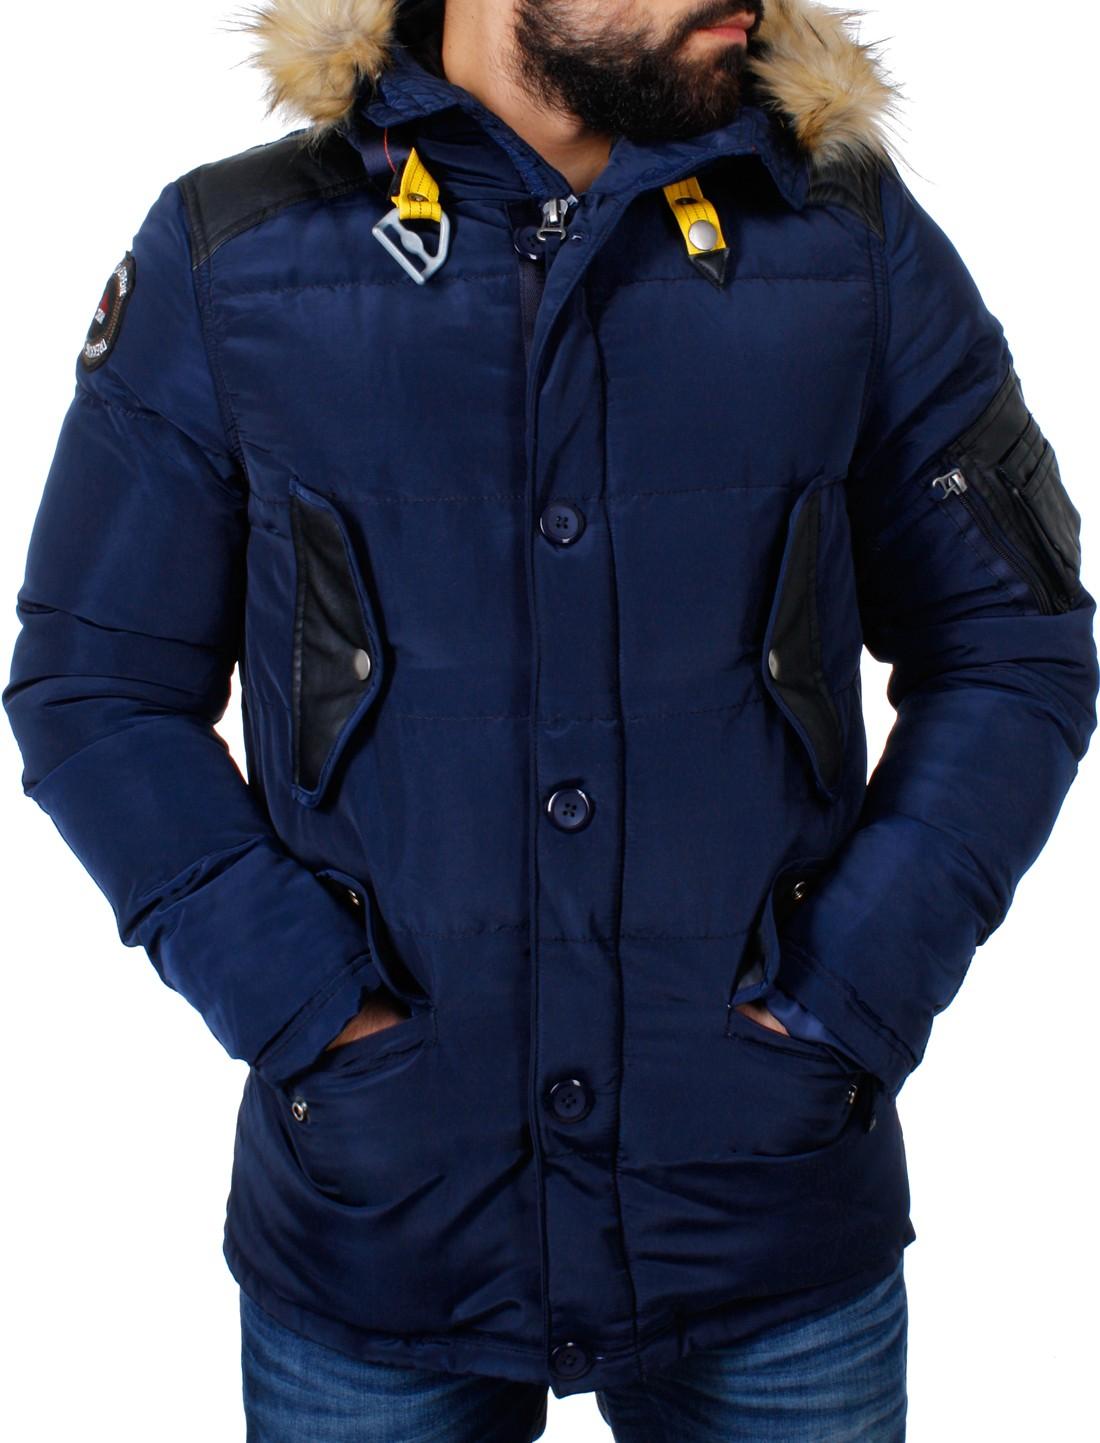 carisma men 39 s parka winter jacket faux fur hood warm thick. Black Bedroom Furniture Sets. Home Design Ideas